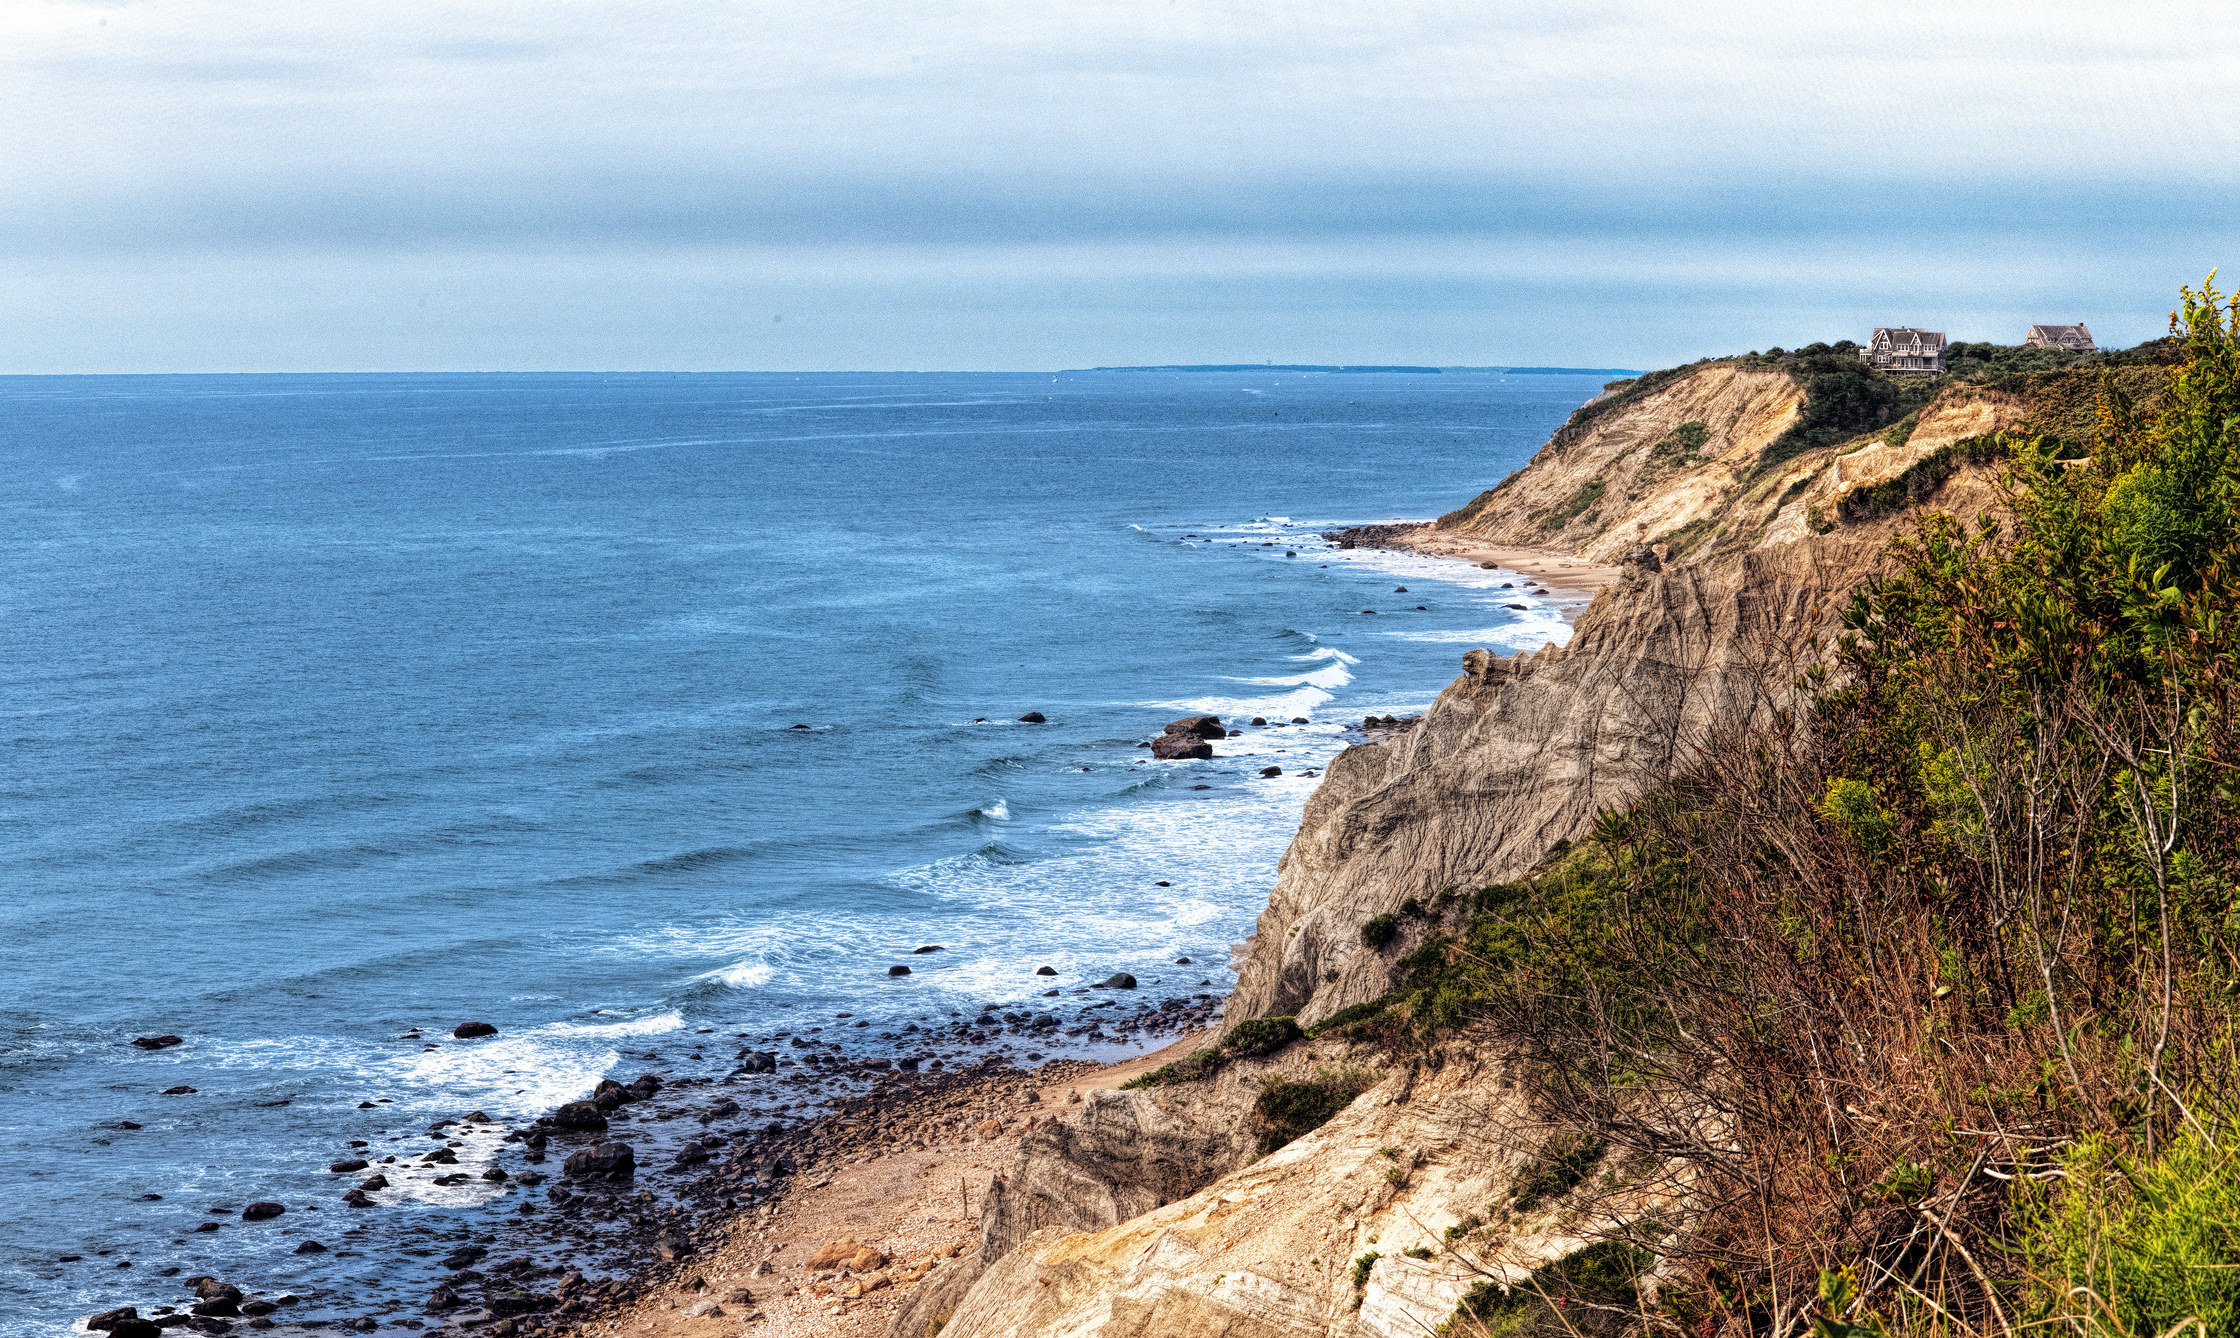 rocky cliffs by the ocean